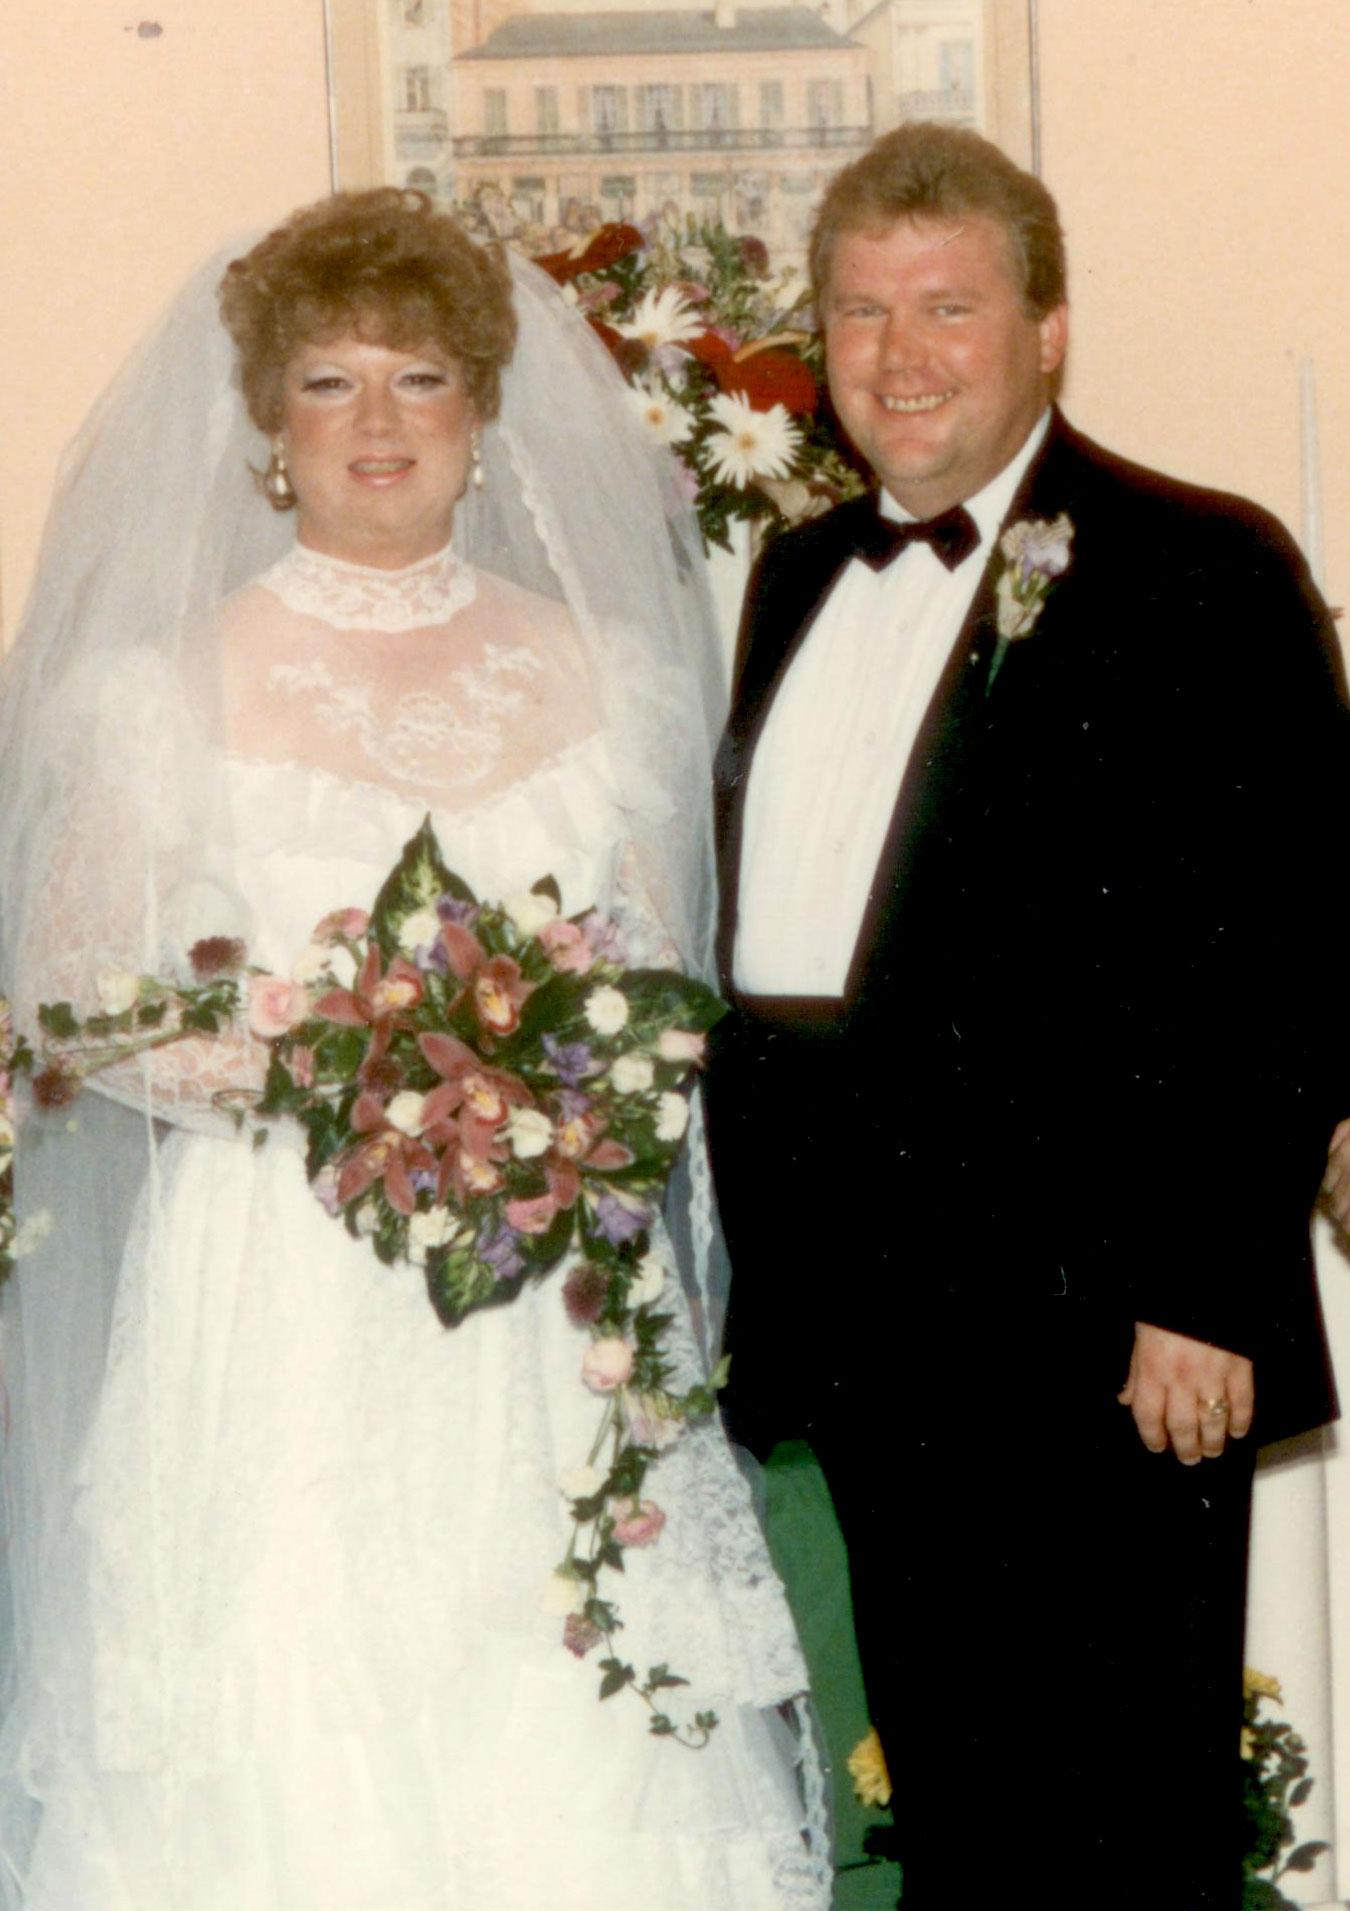 12th Anniversary Rip & Marsha Naquin-Delain 1986